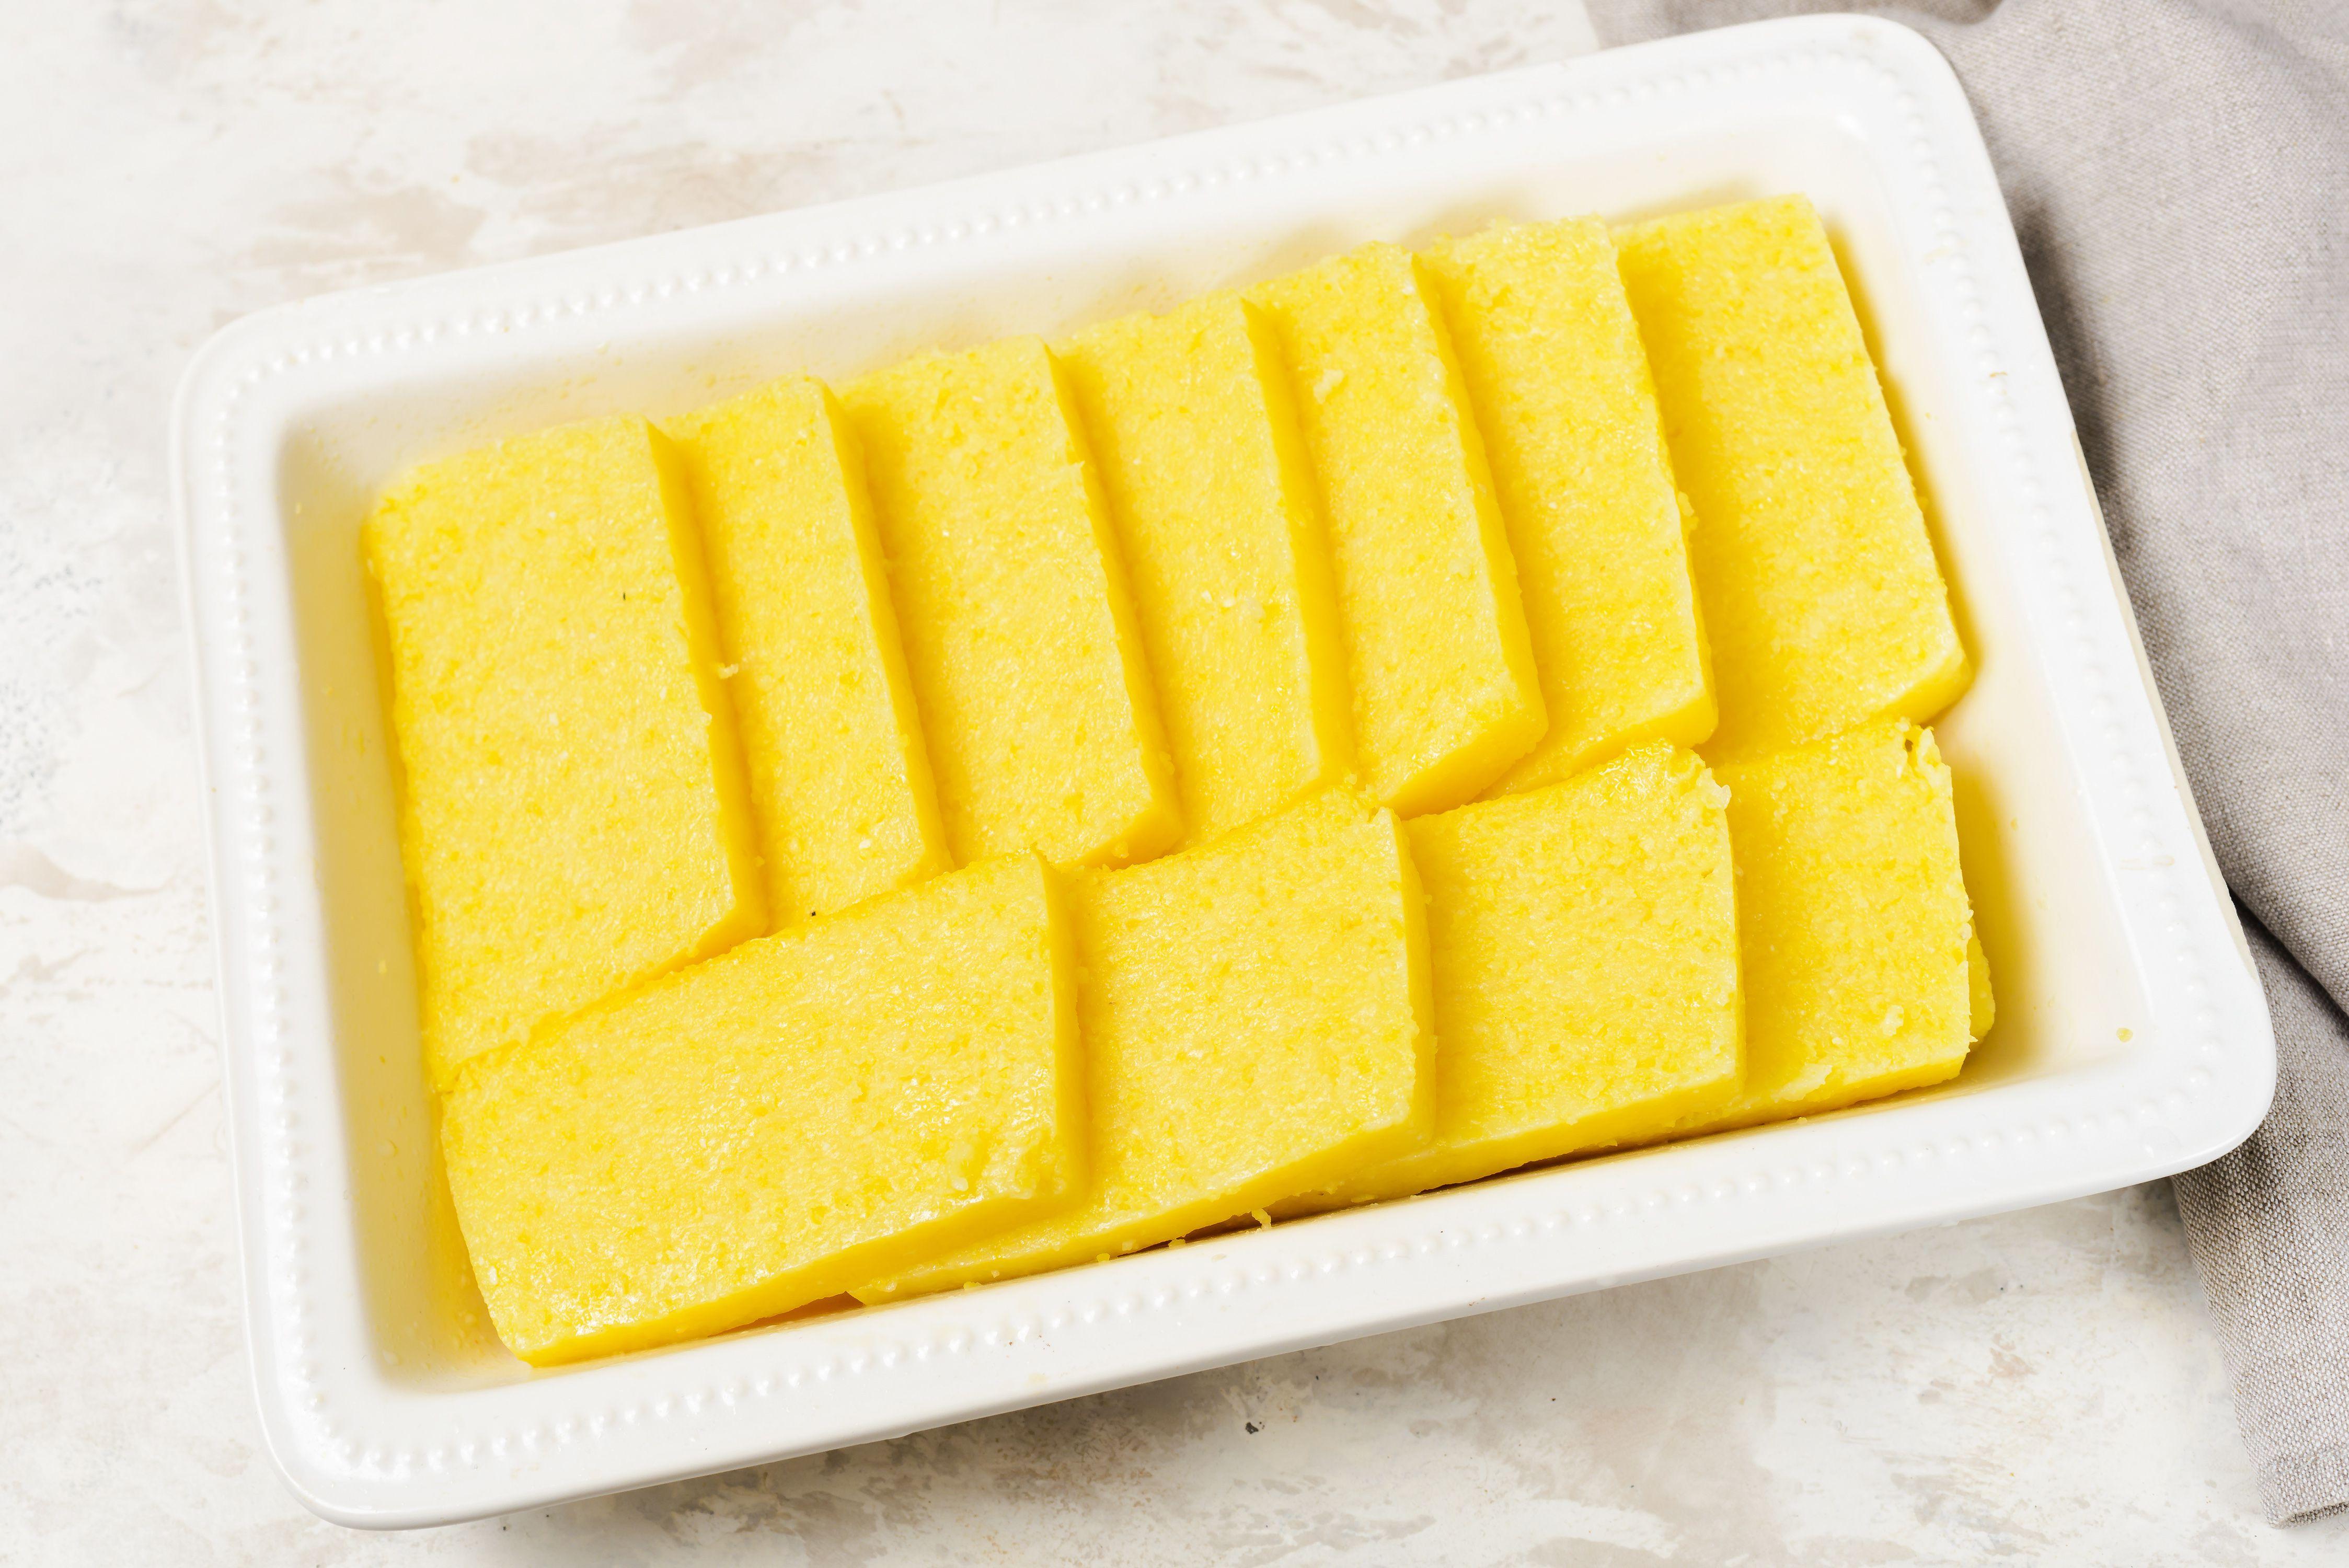 Put slices of polenta on tray